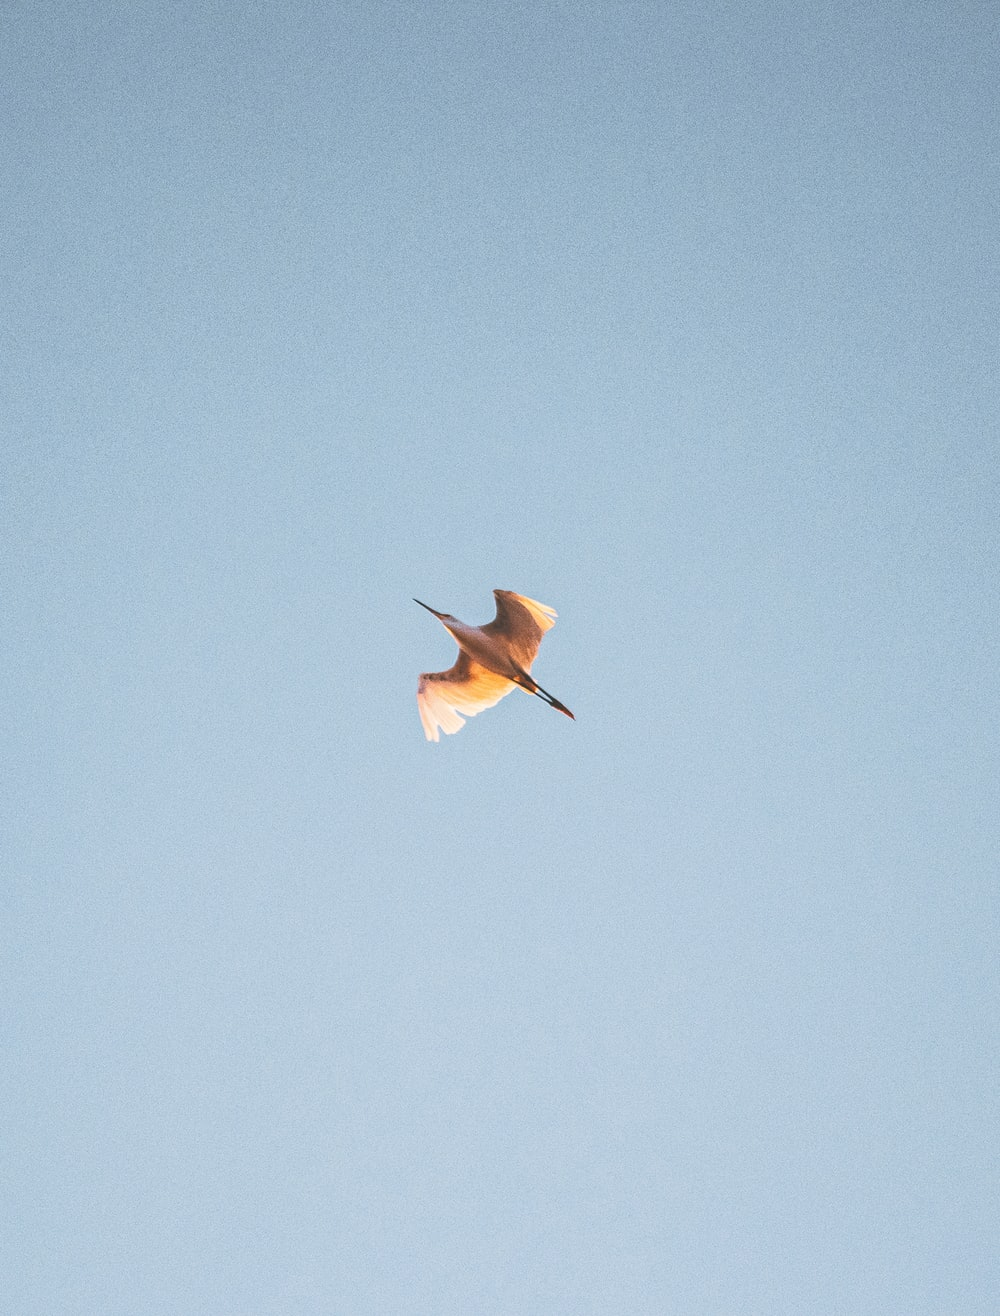 brown bird flying under blue sky during daytime